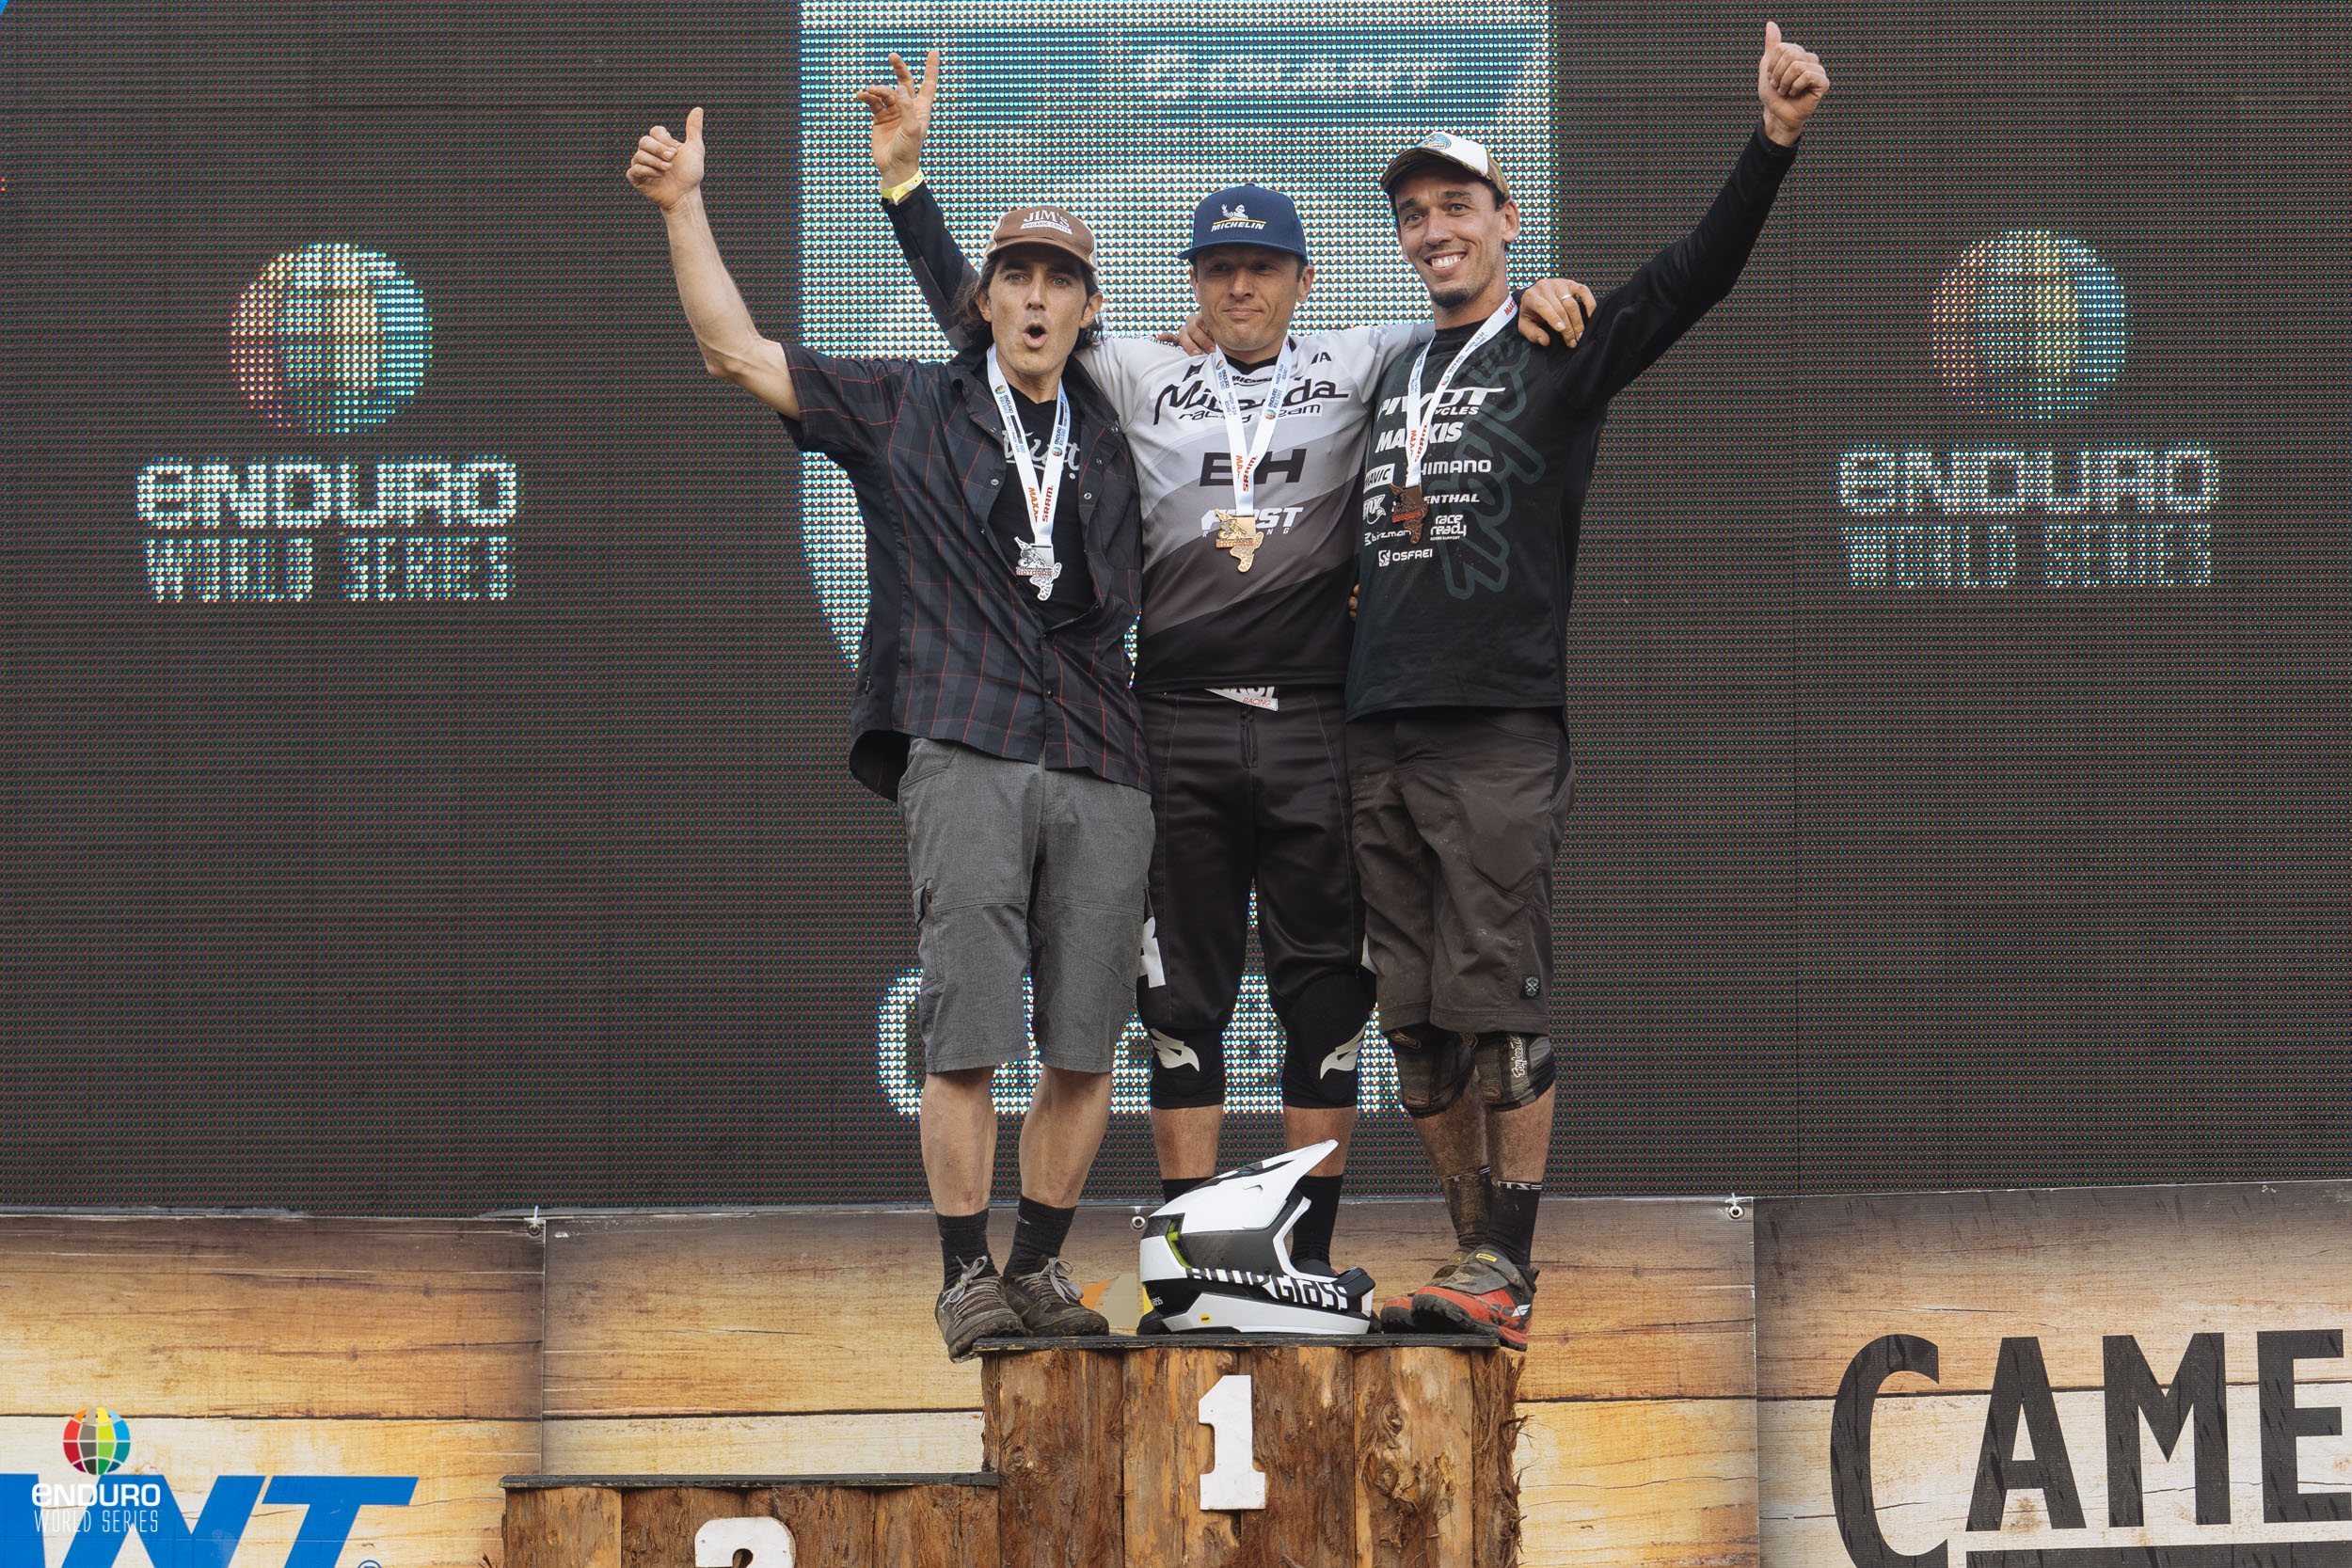 Men Master 40 podium. 1st Karim Amour, 2nd Michael Broderick, 3rd Javier Santiago